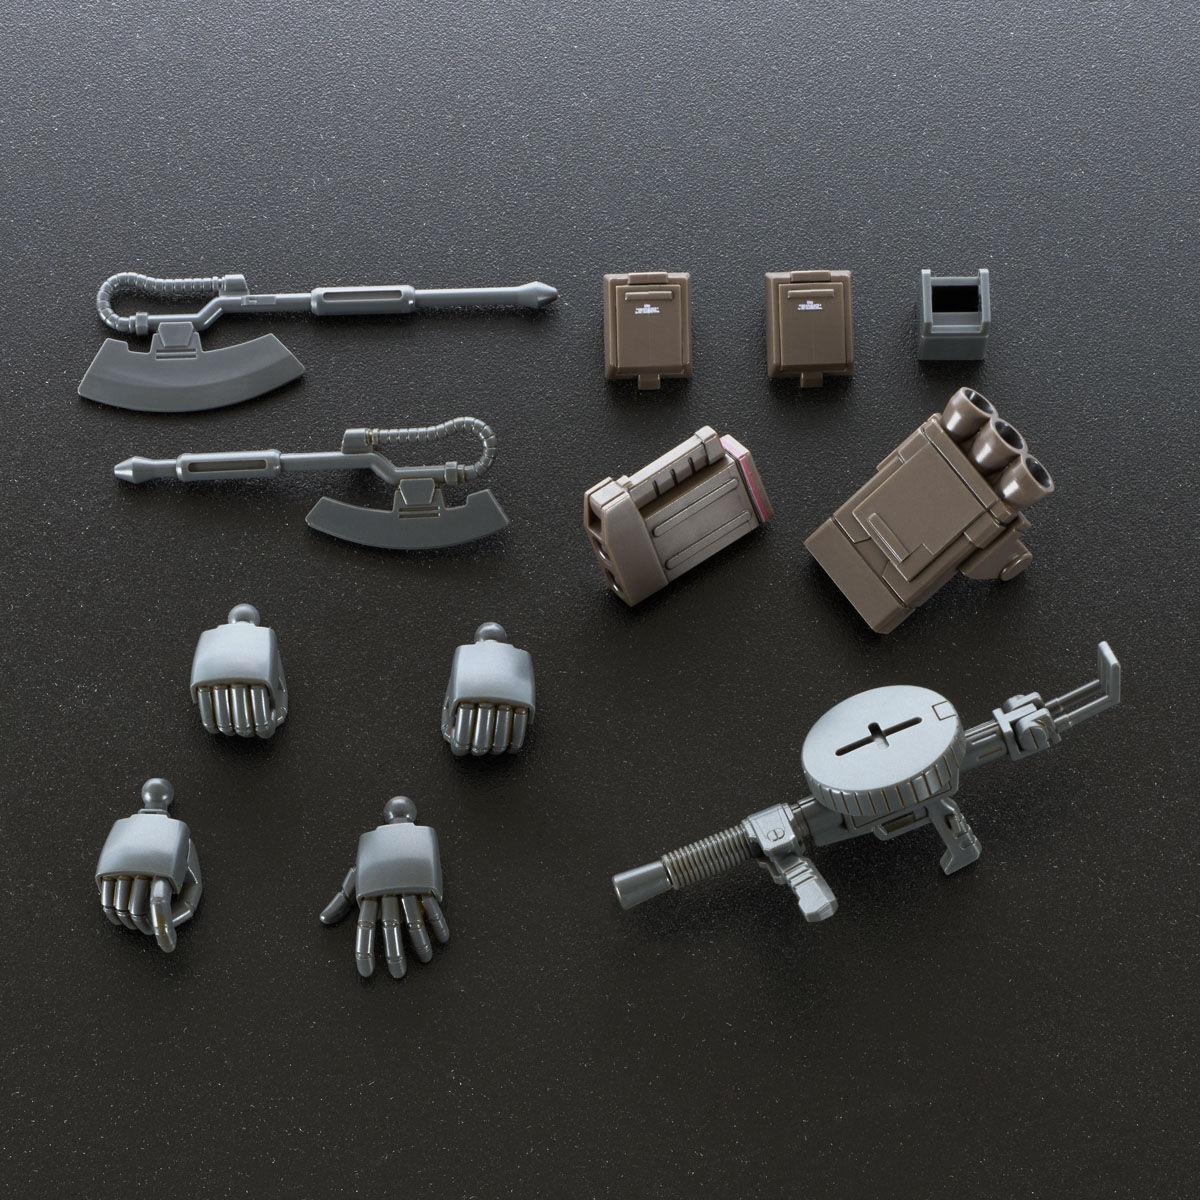 HG 1/144 ZAKU DESERT TYPE(DOUBLE ANTENNA TYPE)  [Nov 2021 Delivery]